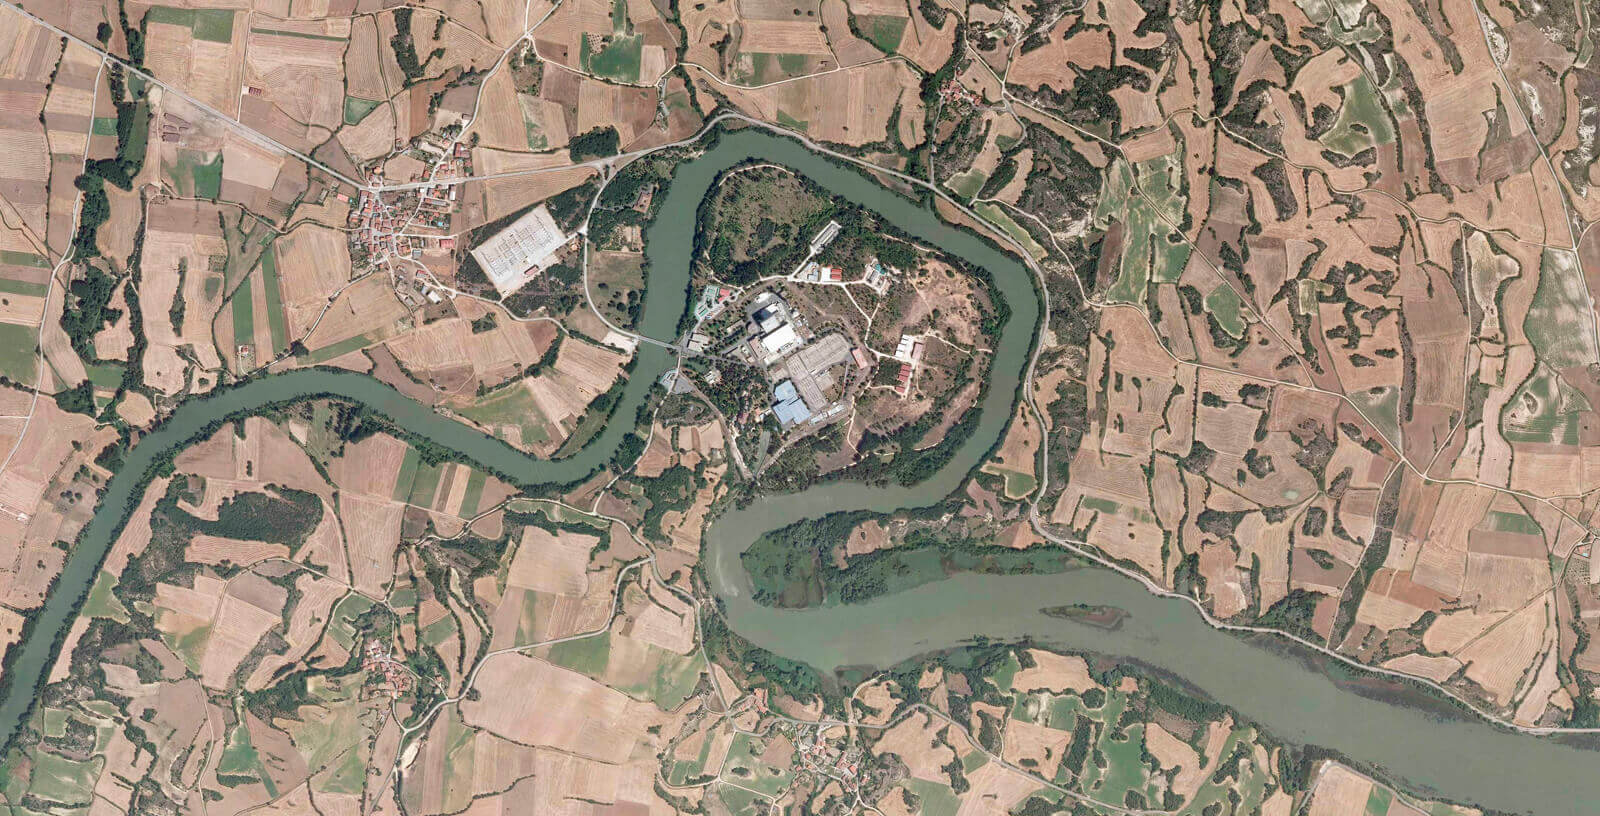 Idom_Nuclear_Services_Geotechnical_study_AECC_Santa_Mar_a_de_Garo_a_NPP_2